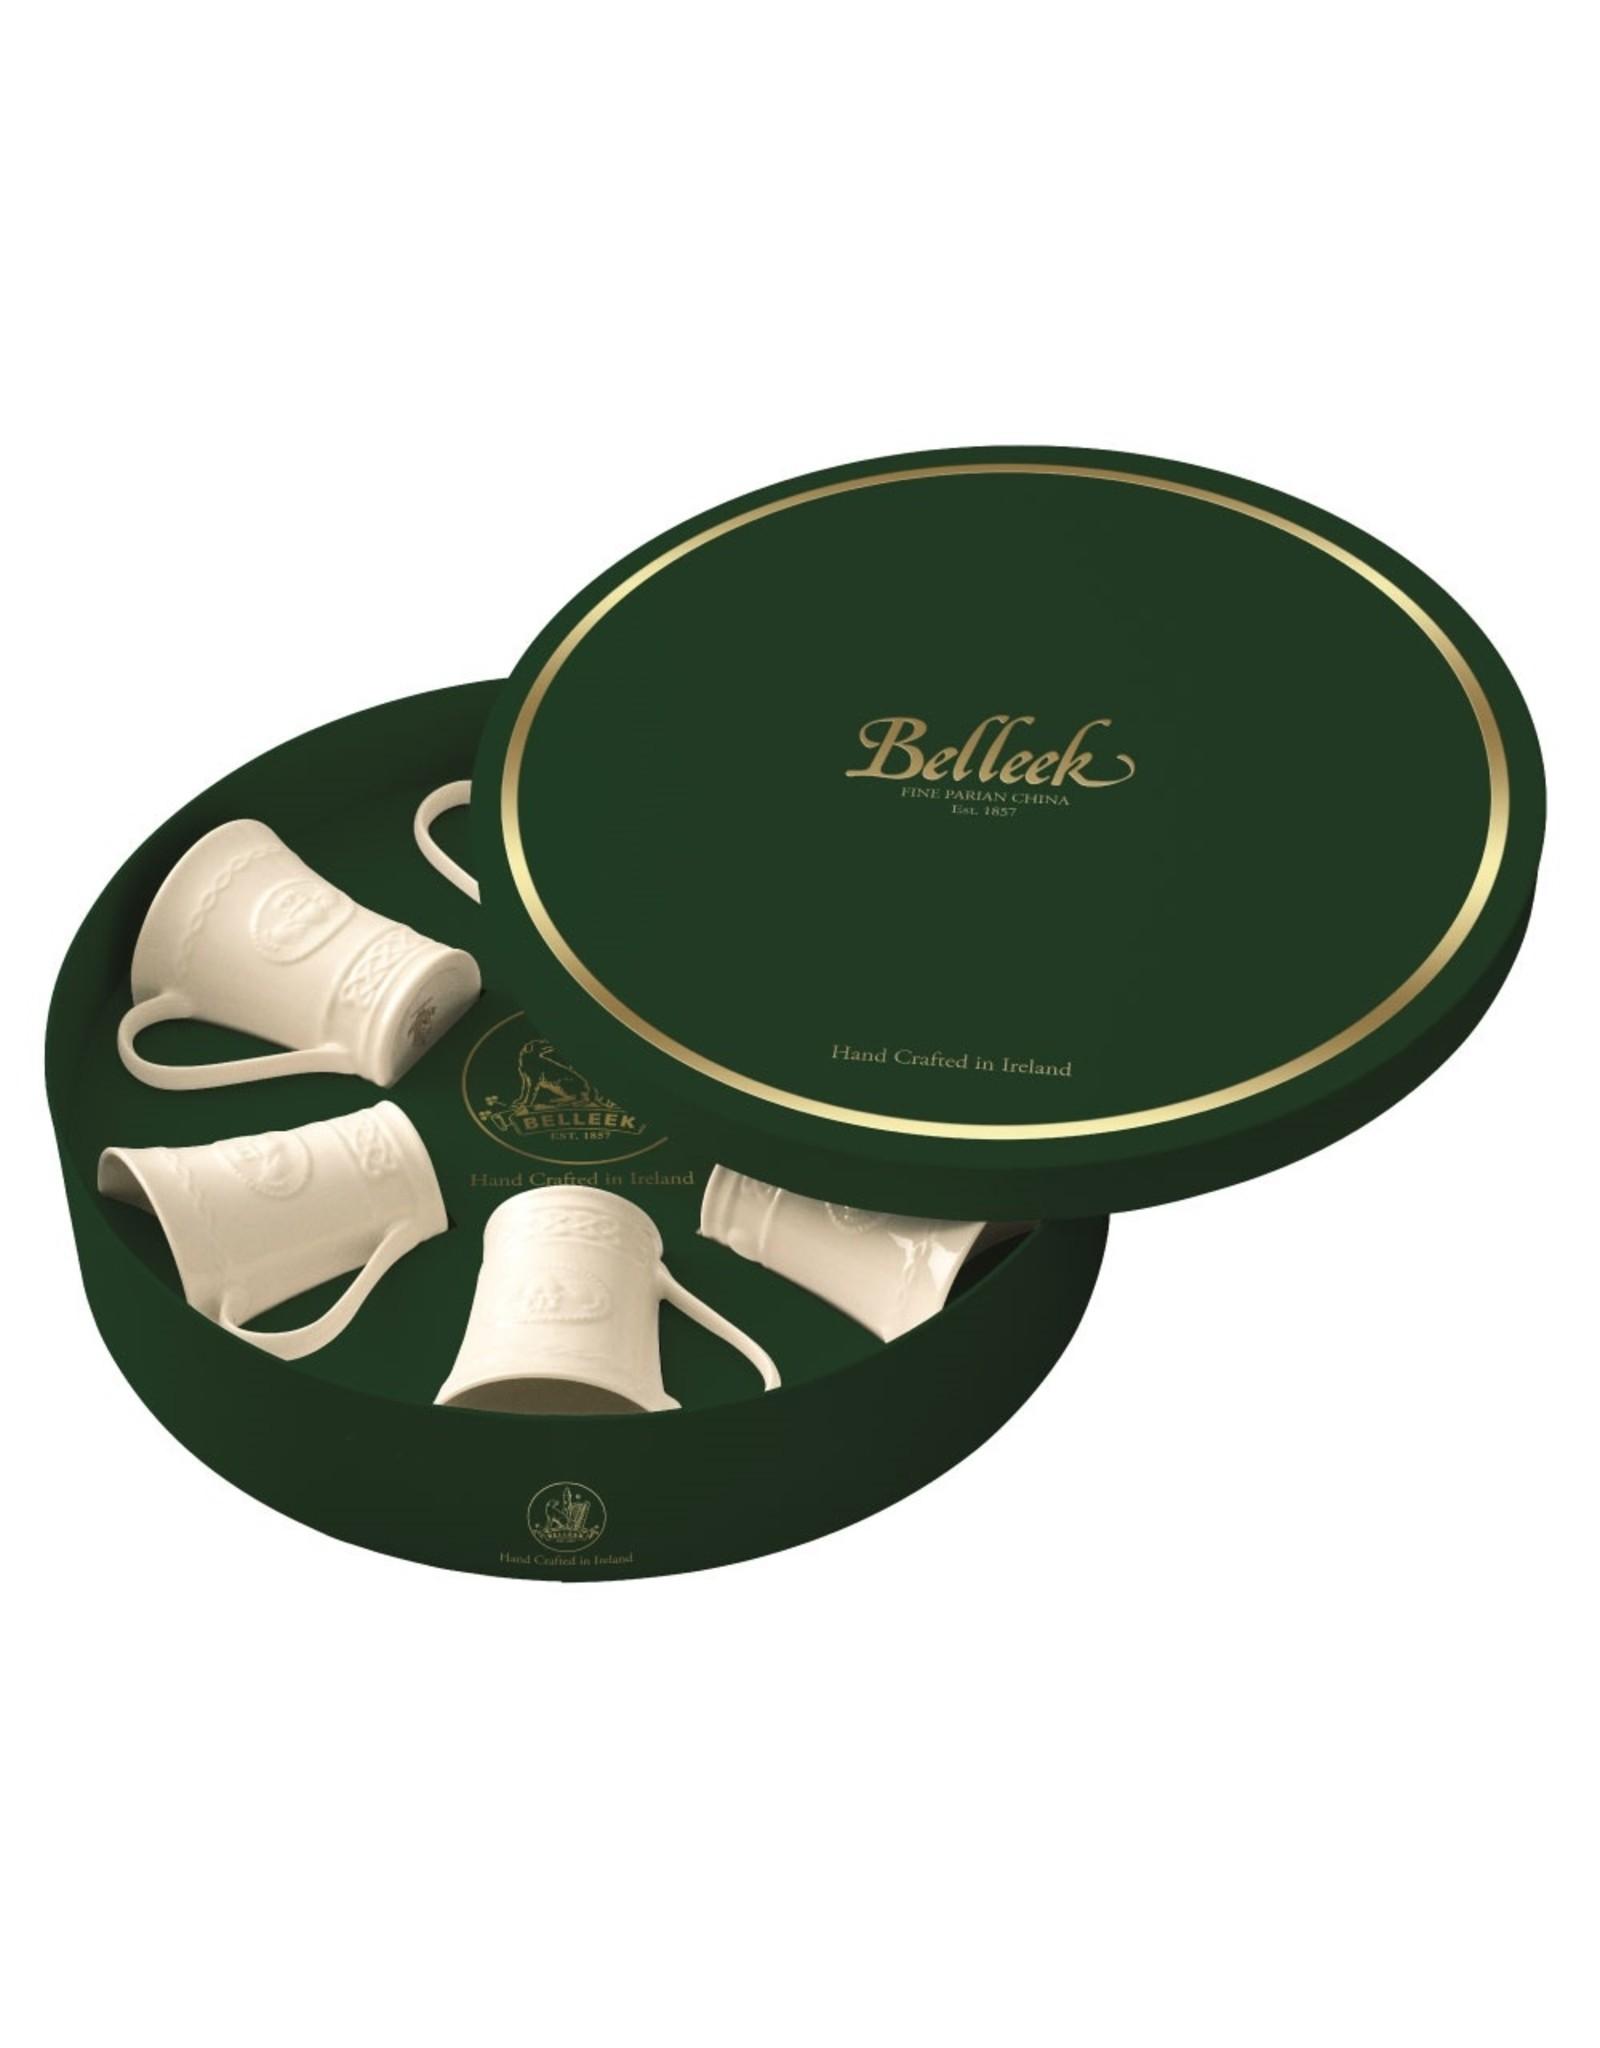 Belleek Claddagh 6 Mug Gift Set by Belleek